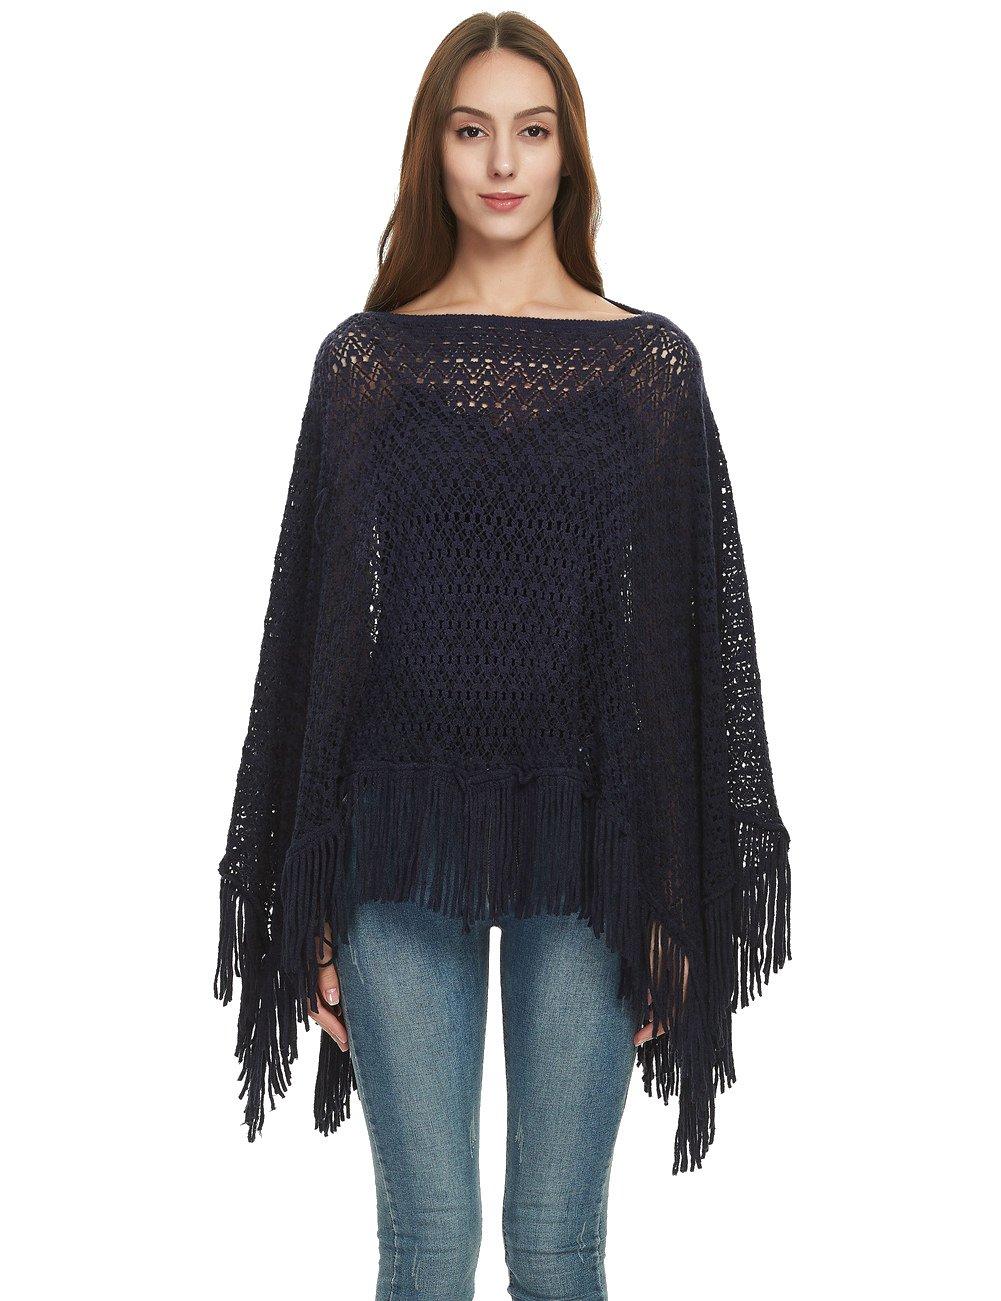 Ferand Crochet Knit Fringe Poncho Shawl Wrap Casual Boat Neck Tops for Women, One Size, Navy blue